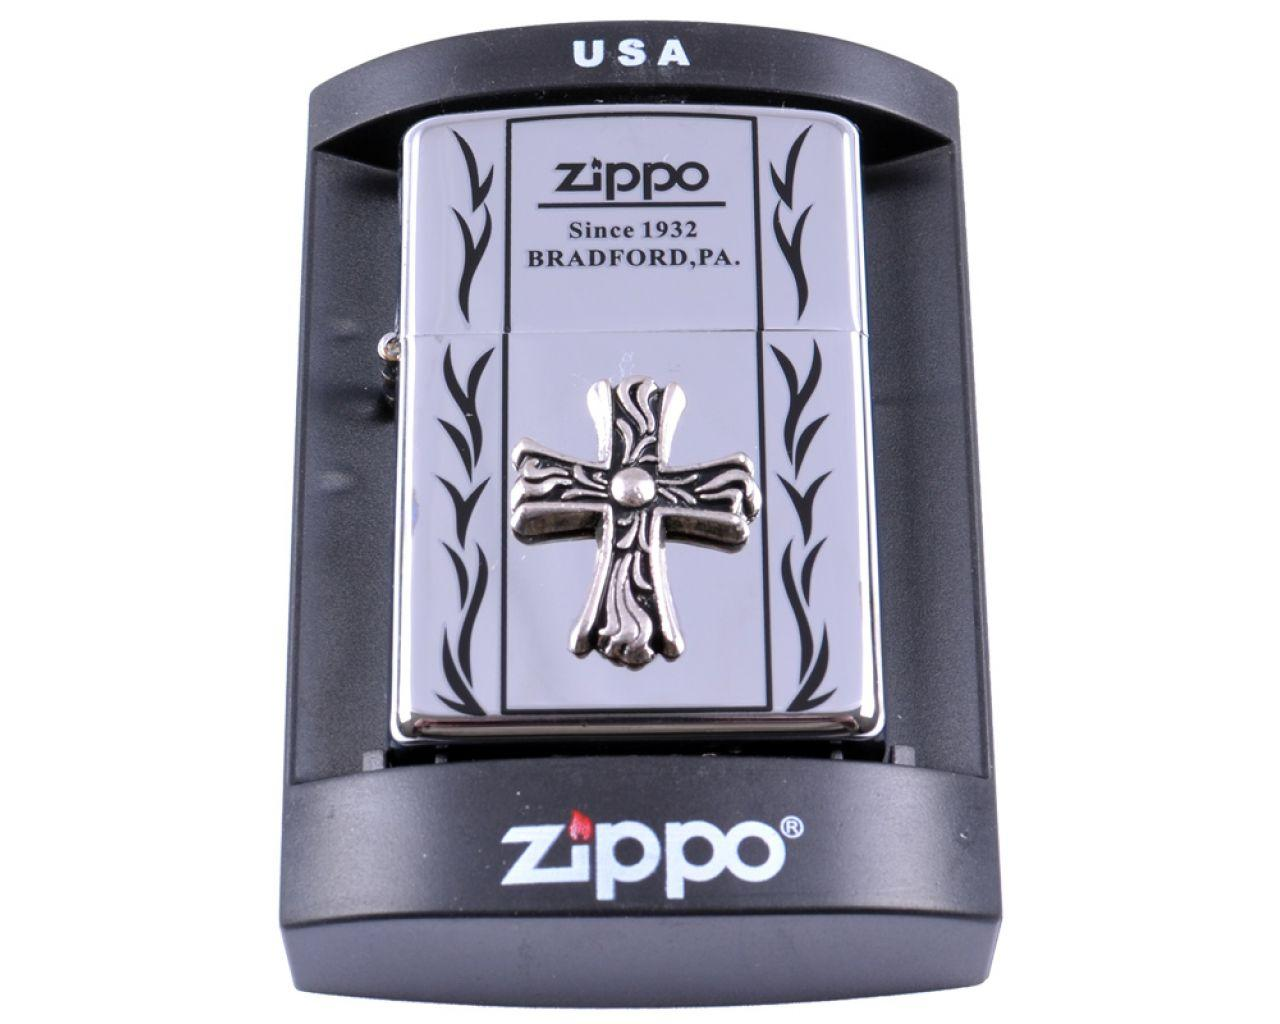 Зажигалка бензиновая Zippo BRADFORD,PA. №4234-3